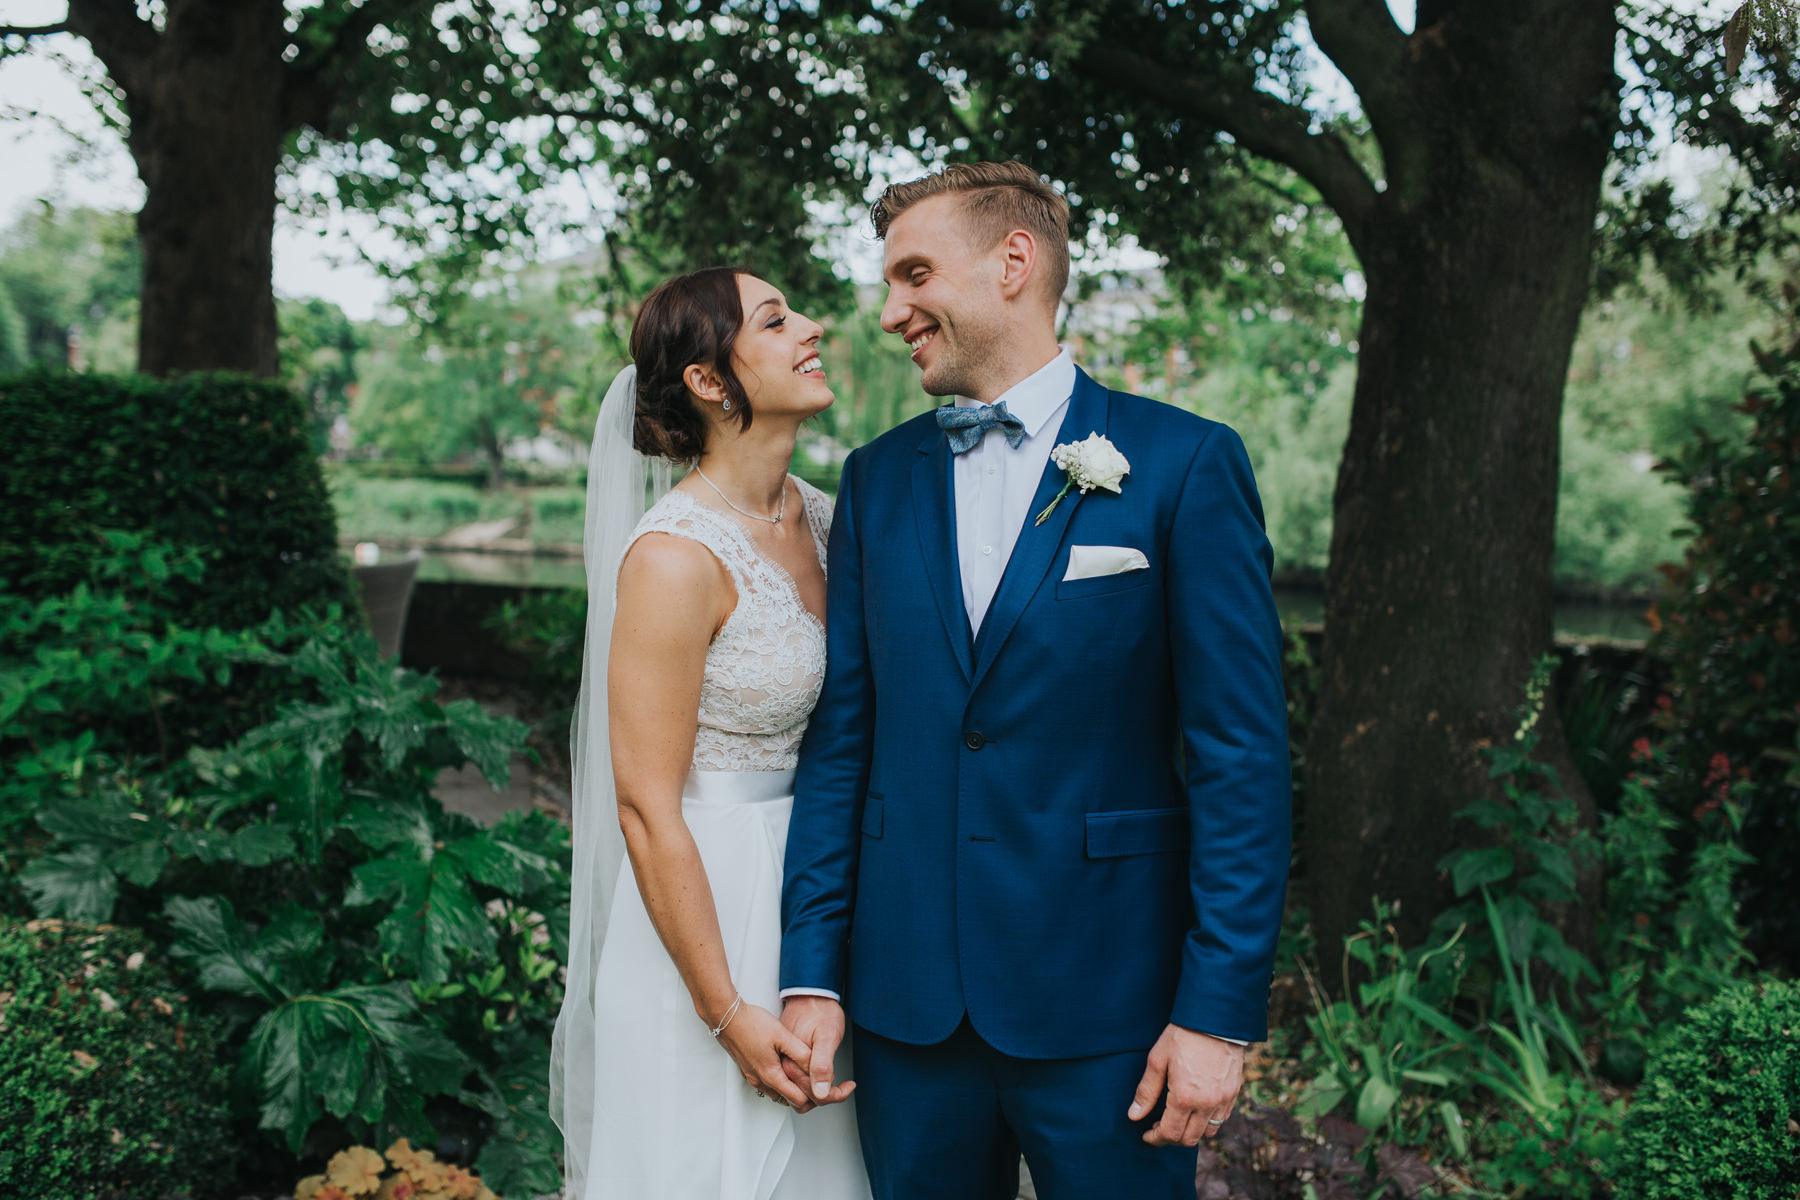 CRL-324-The Bingham wedding Richmond-Claire Rob bridal couple portraits.jpg